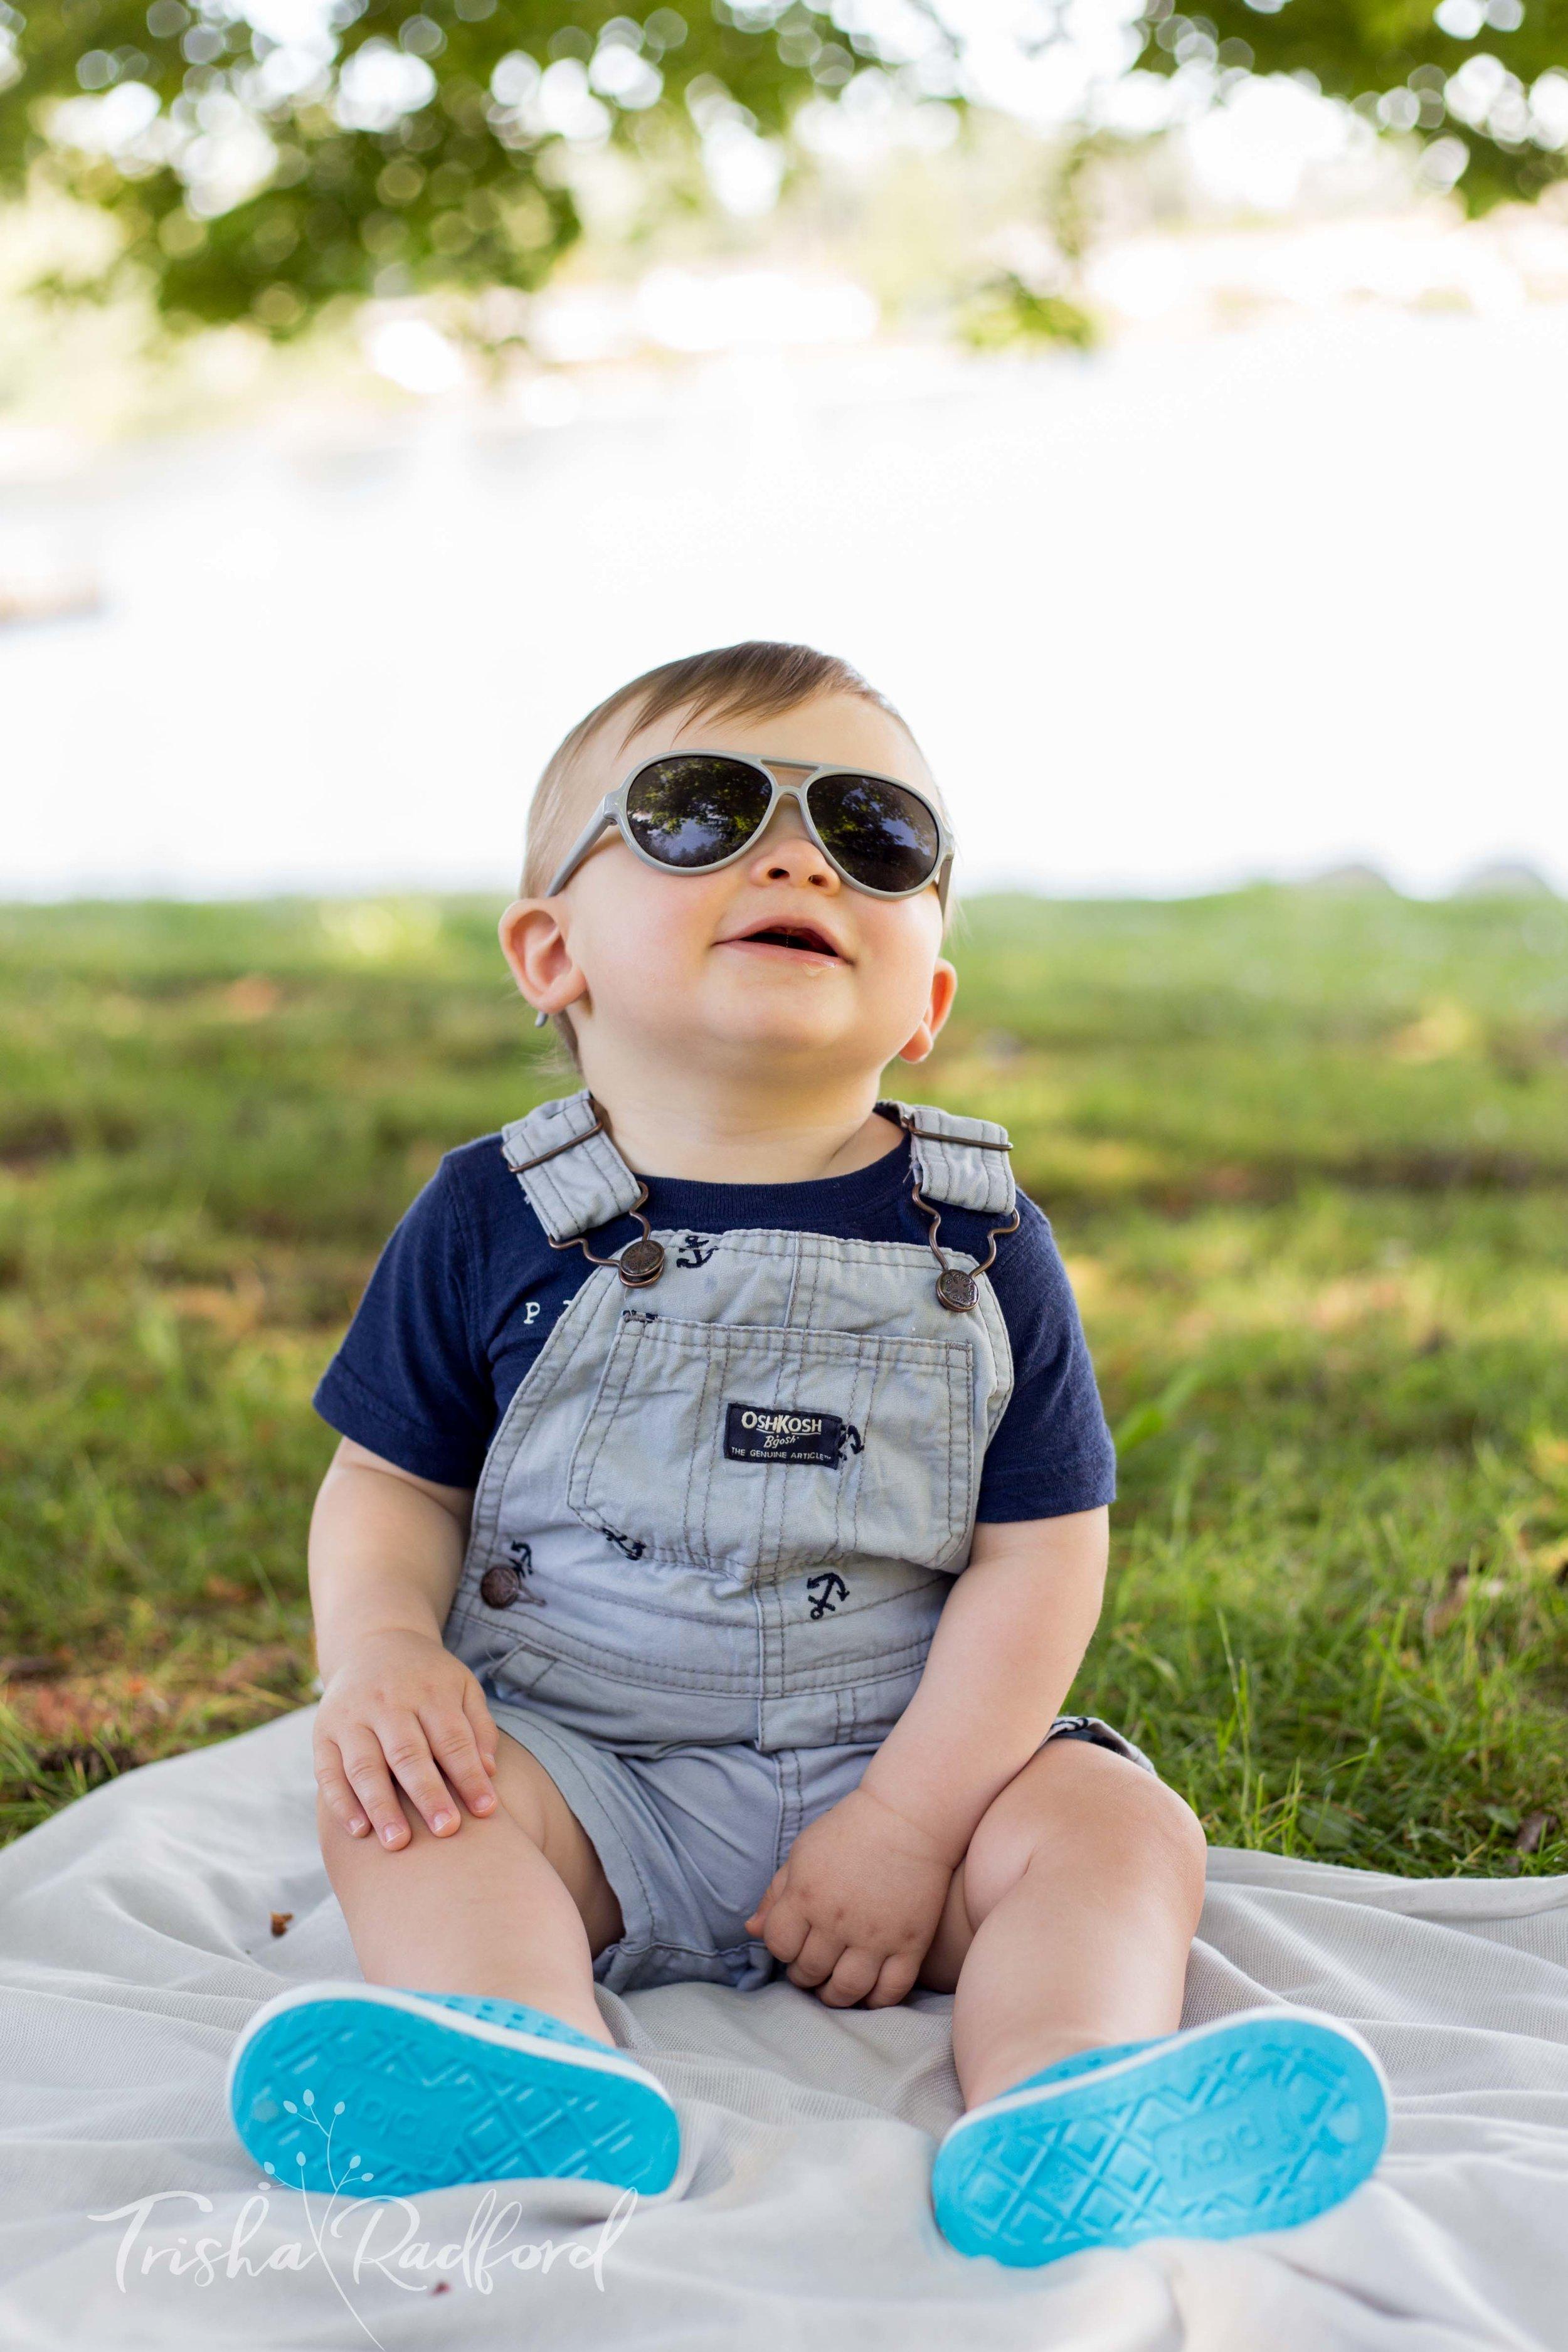 Baby boy wearing sunglasses